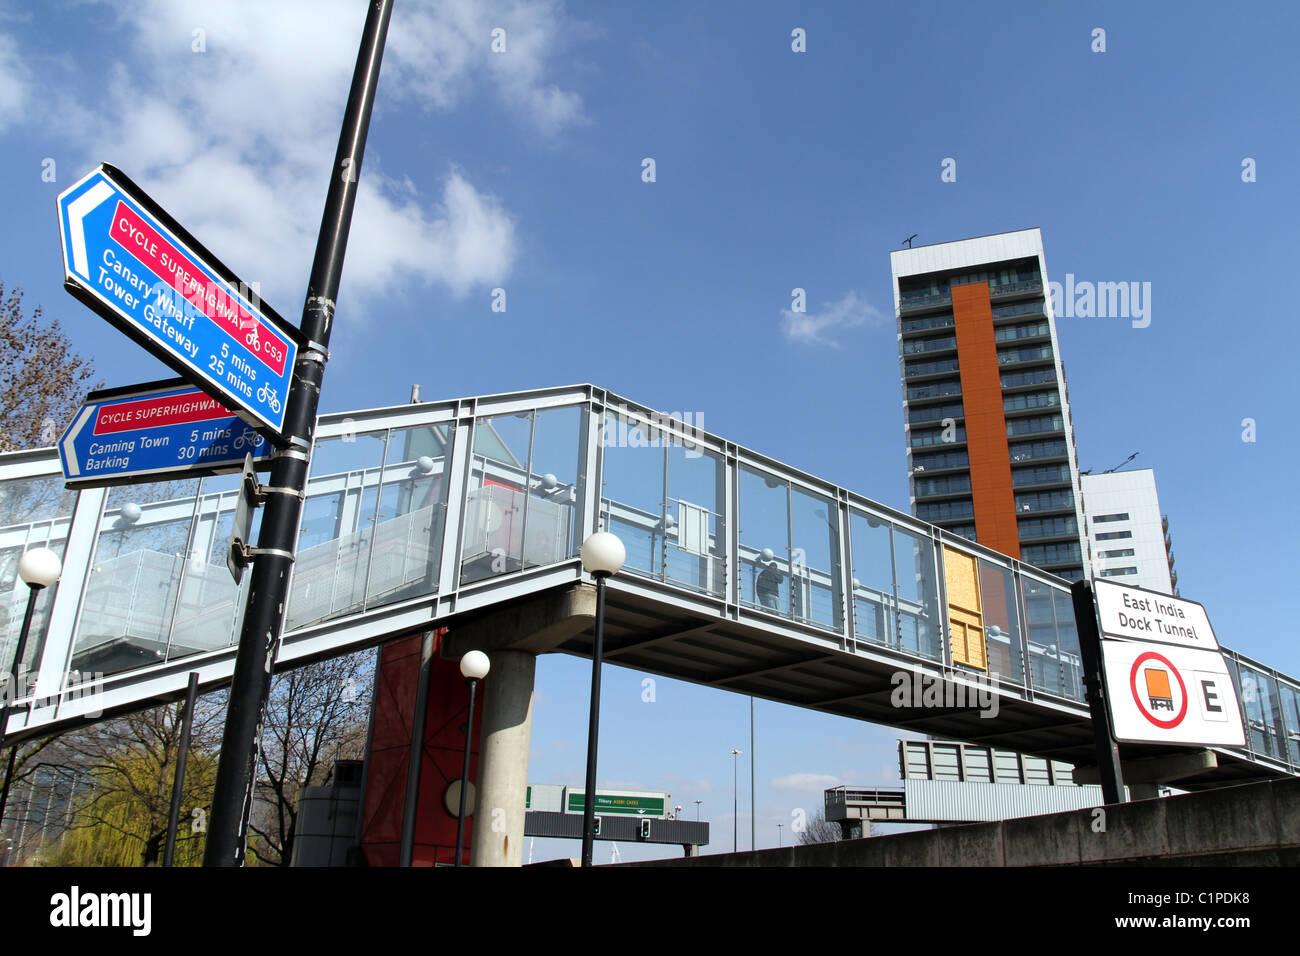 UK.FLYOVER BRIDGE OVER MOTORWAY  IN TOWER HAMLETS, LONDON - Stock Image